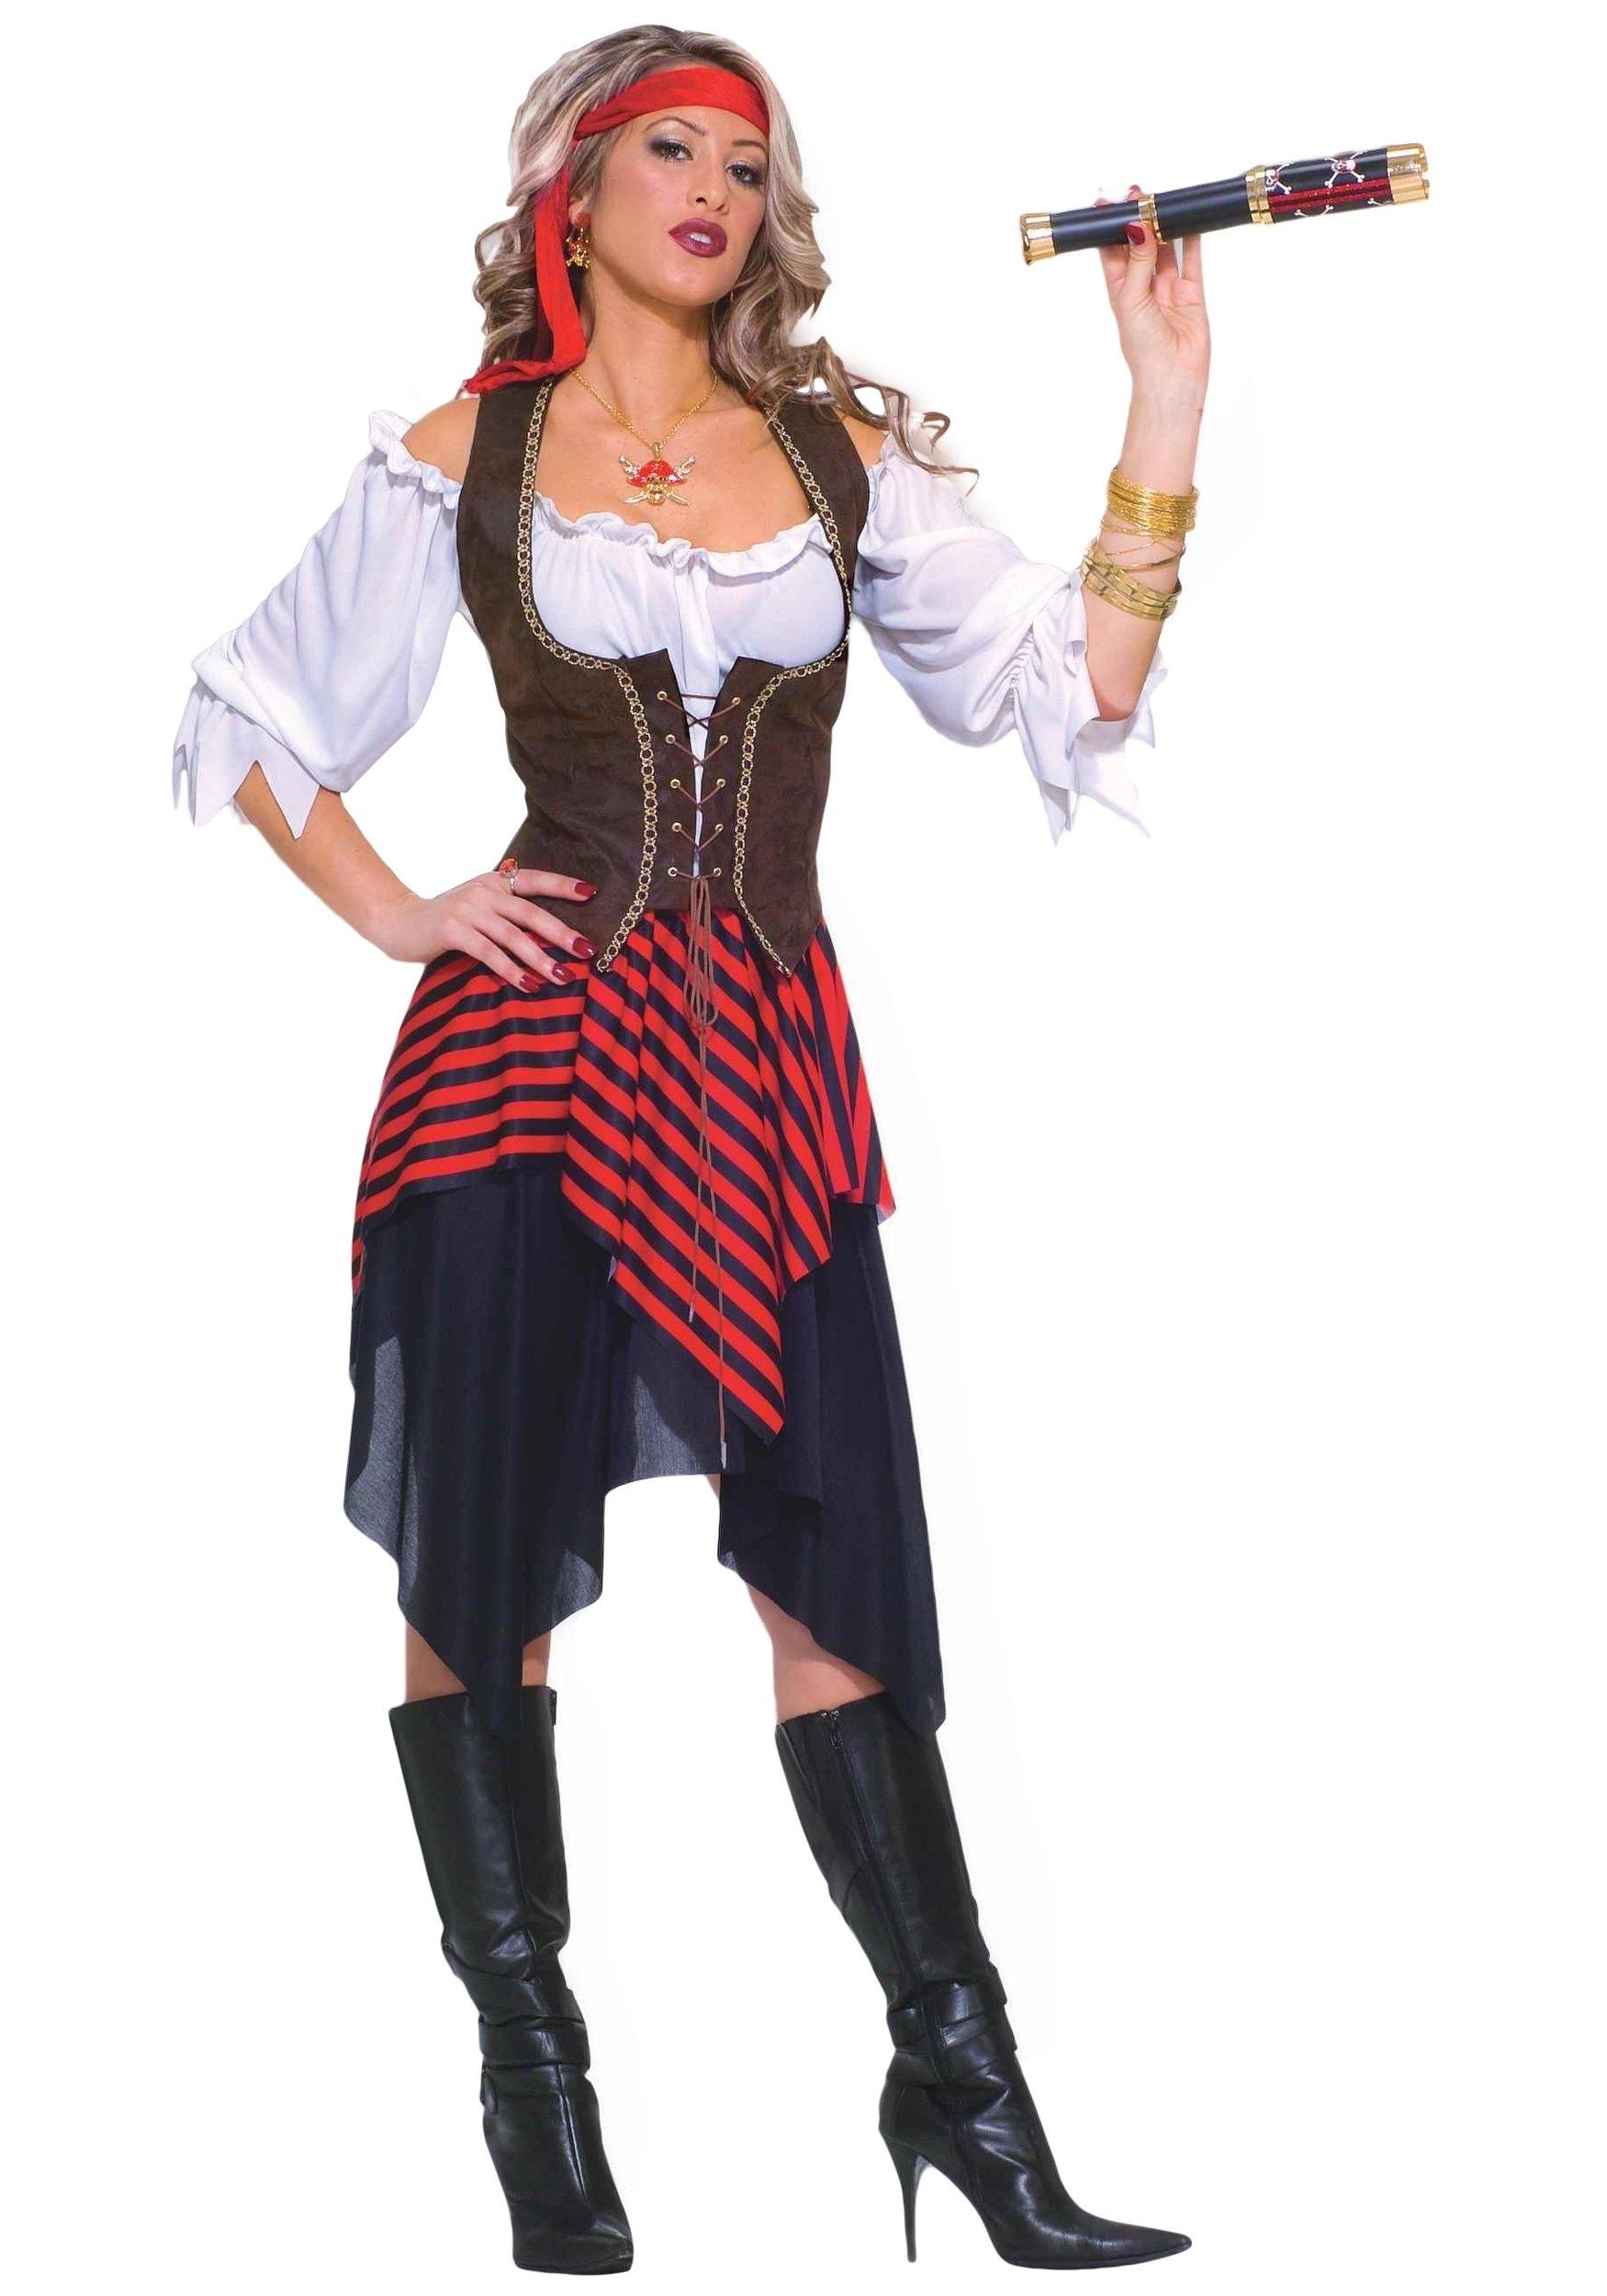 10 Stunning Halloween Costume Ideas For Adults sweet buccaneer costume